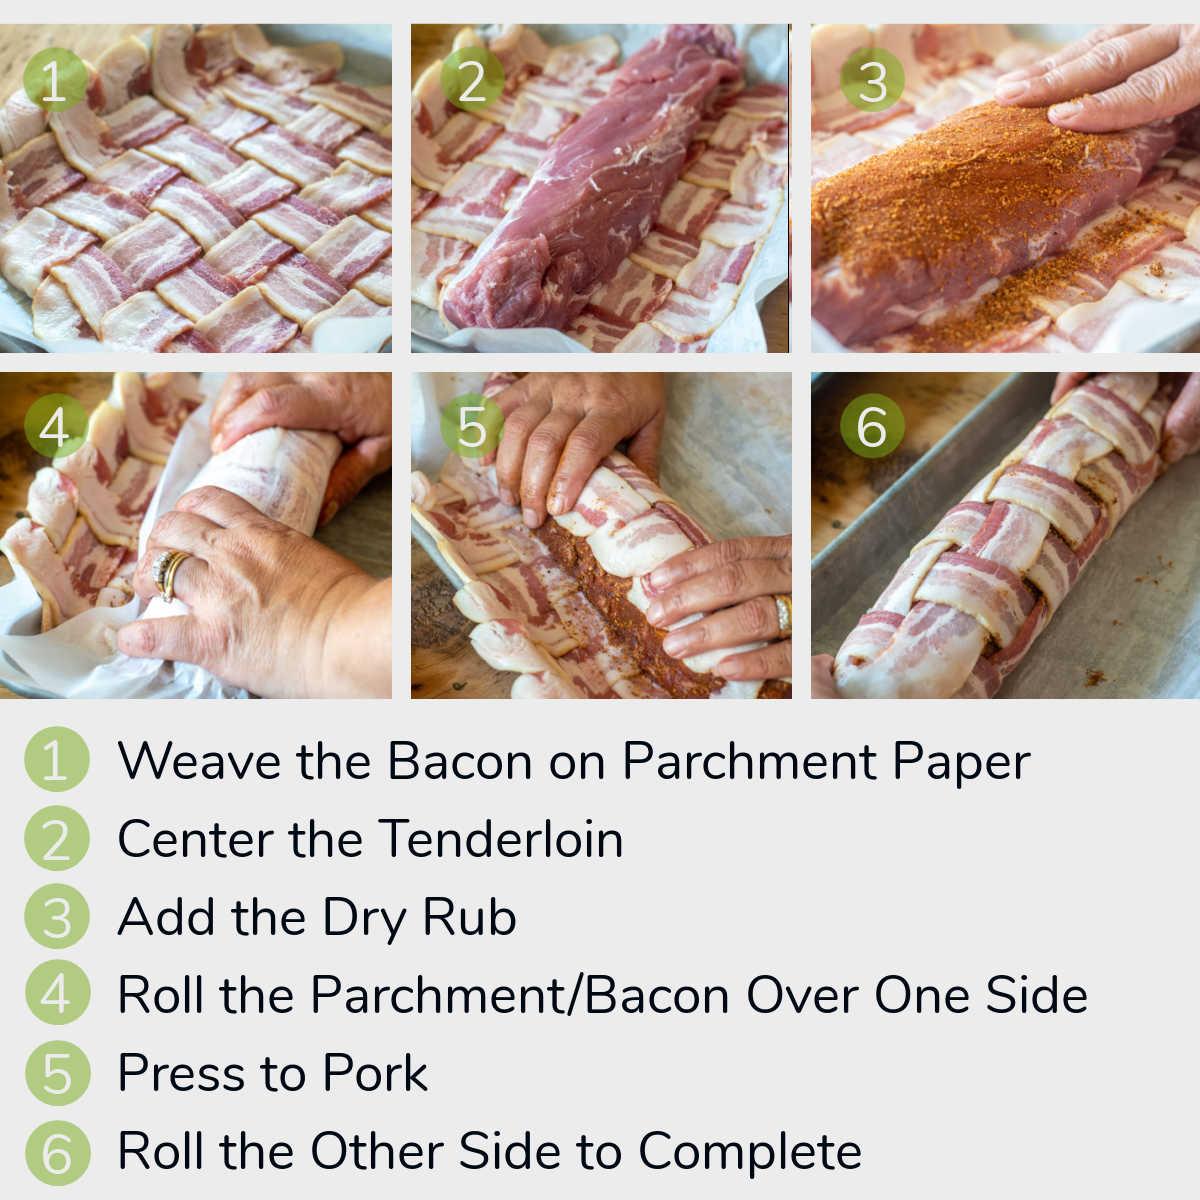 six photos showing how to weave, season, and wrap the pork tenderloin in bacon